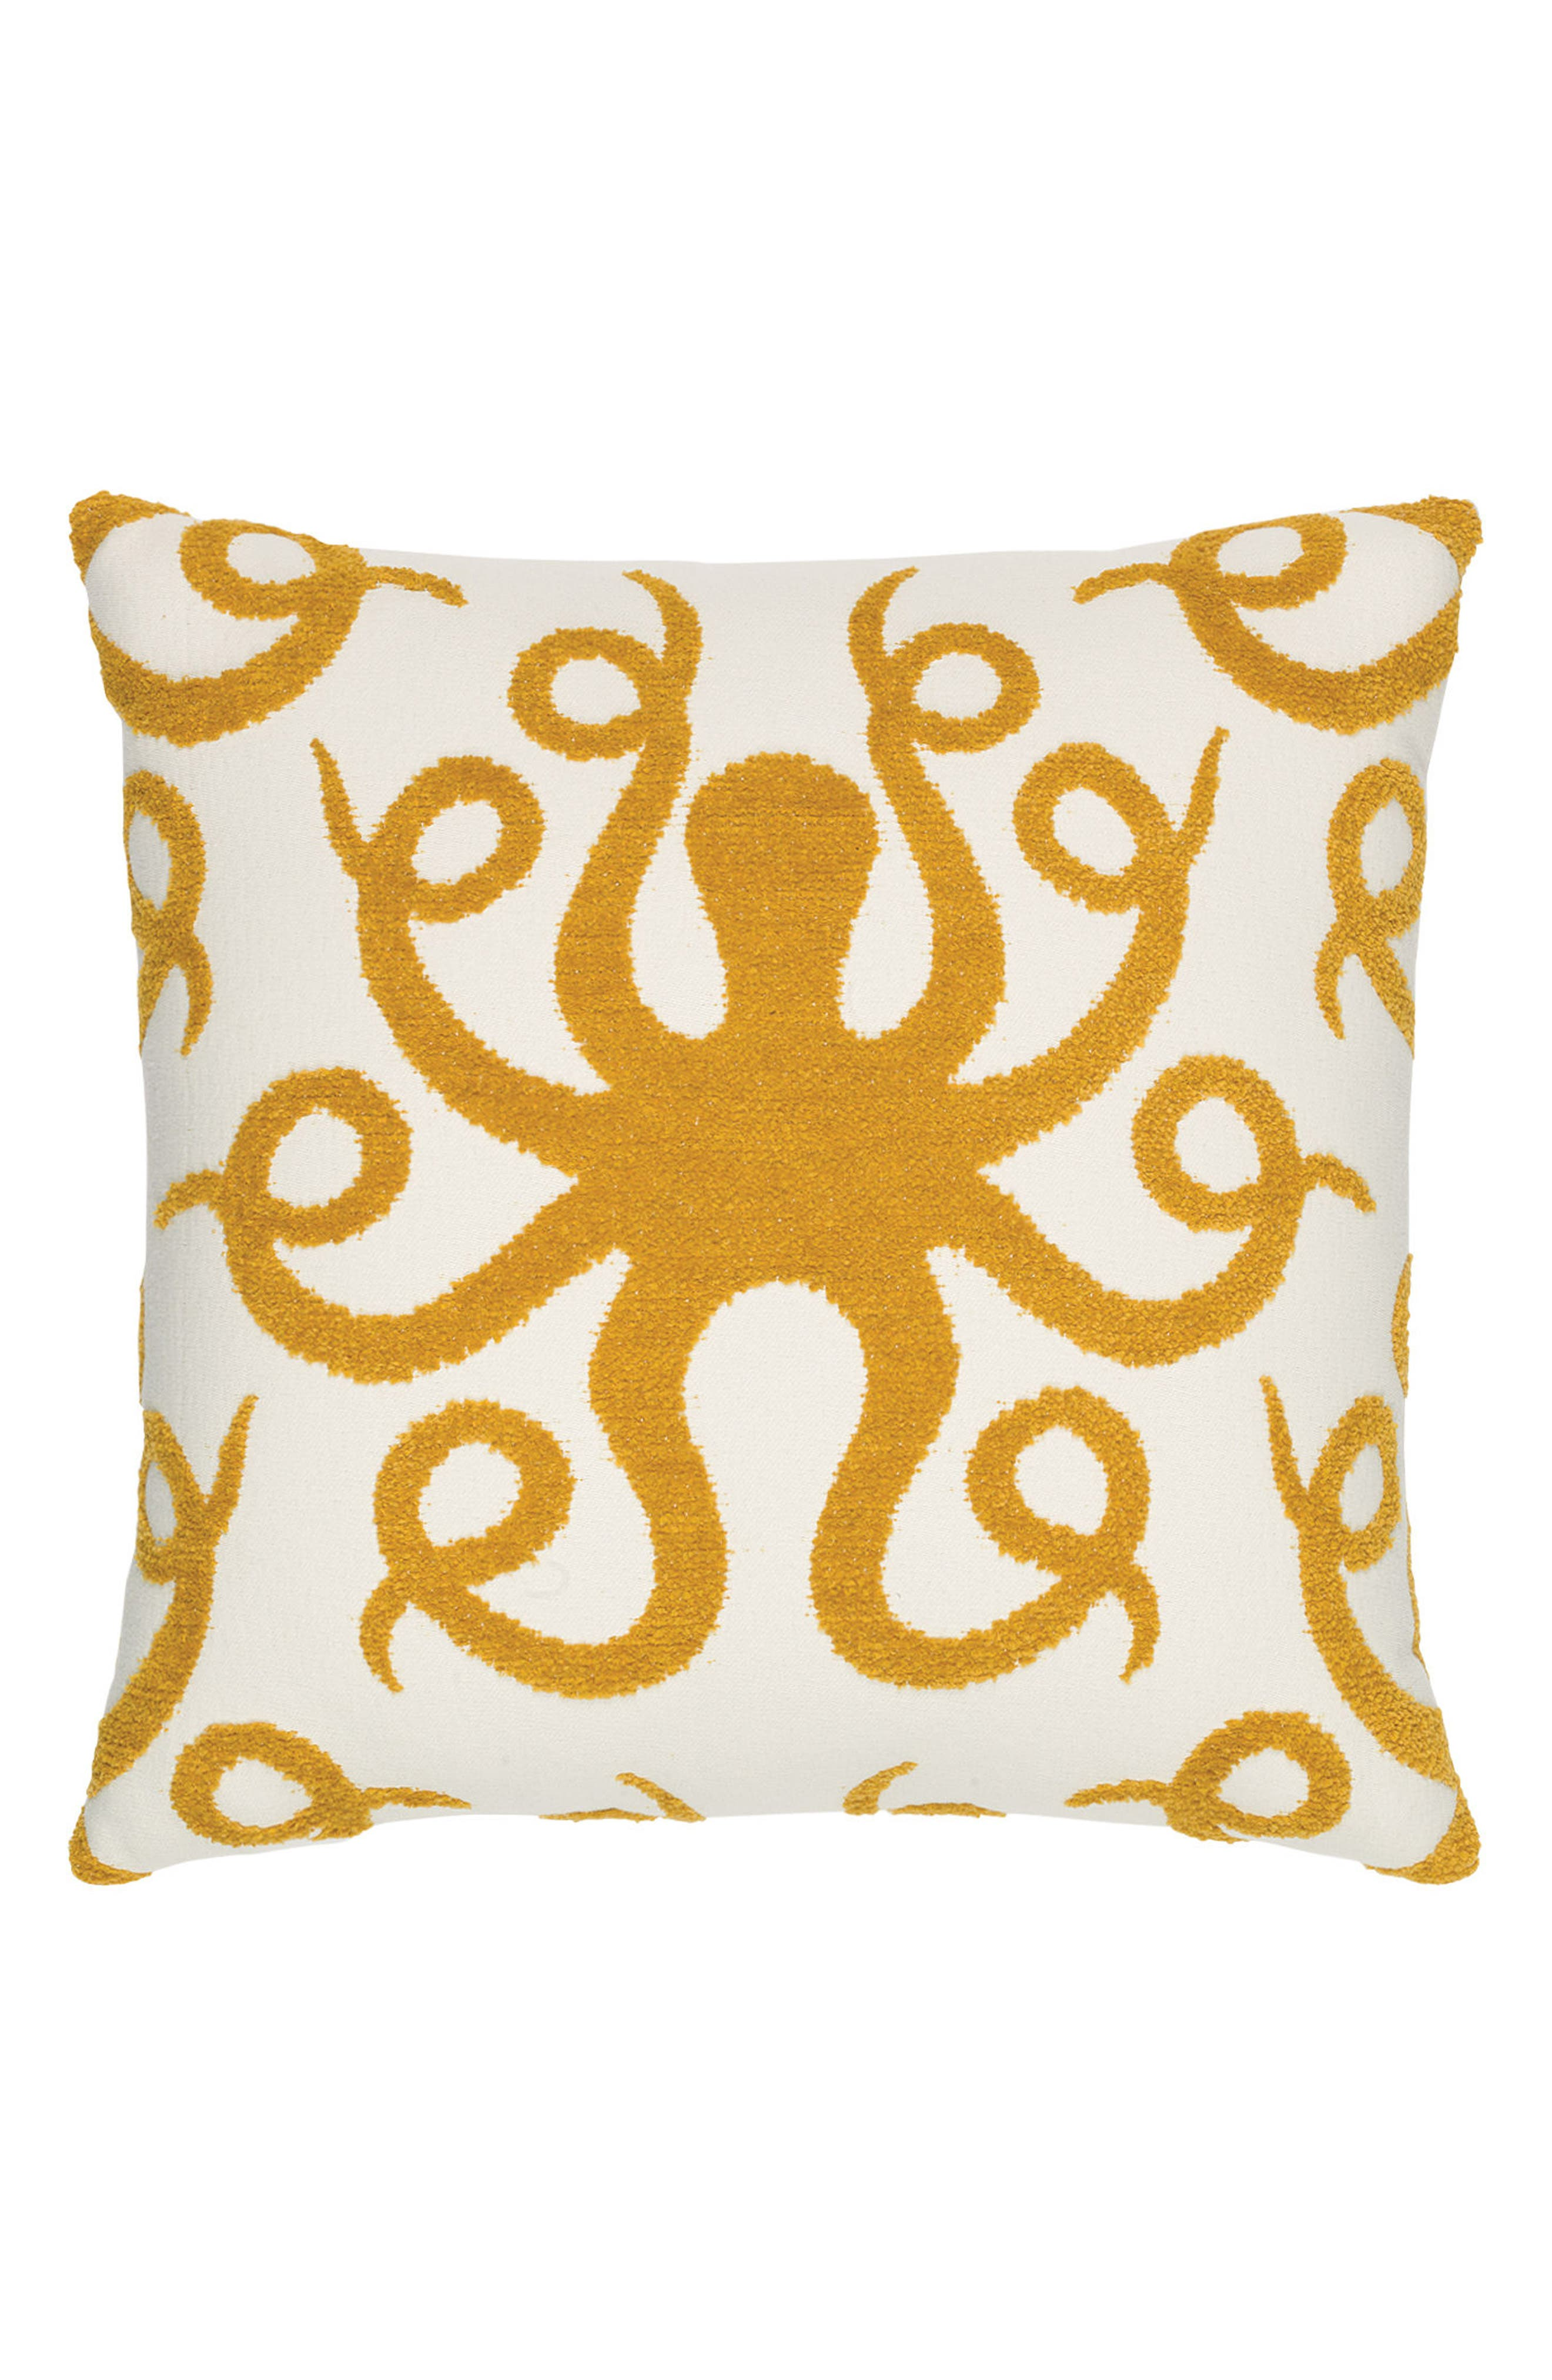 Elaine Smith Octoplush Indoor/Outdoor Accent Pillow